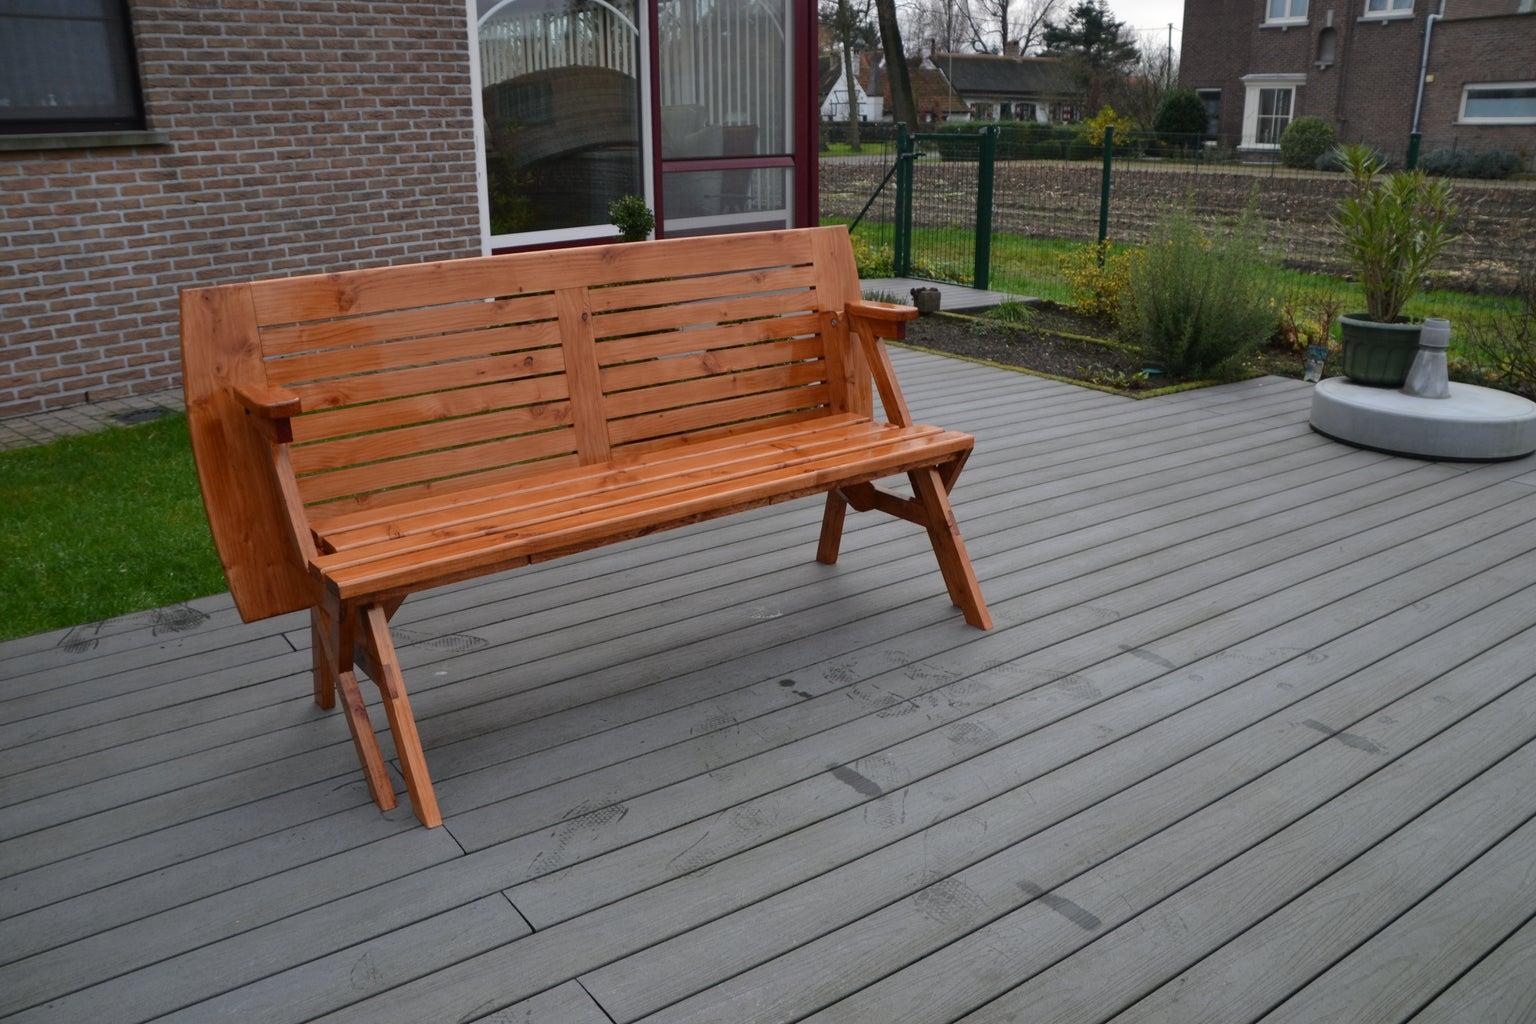 Convertible Bench/table